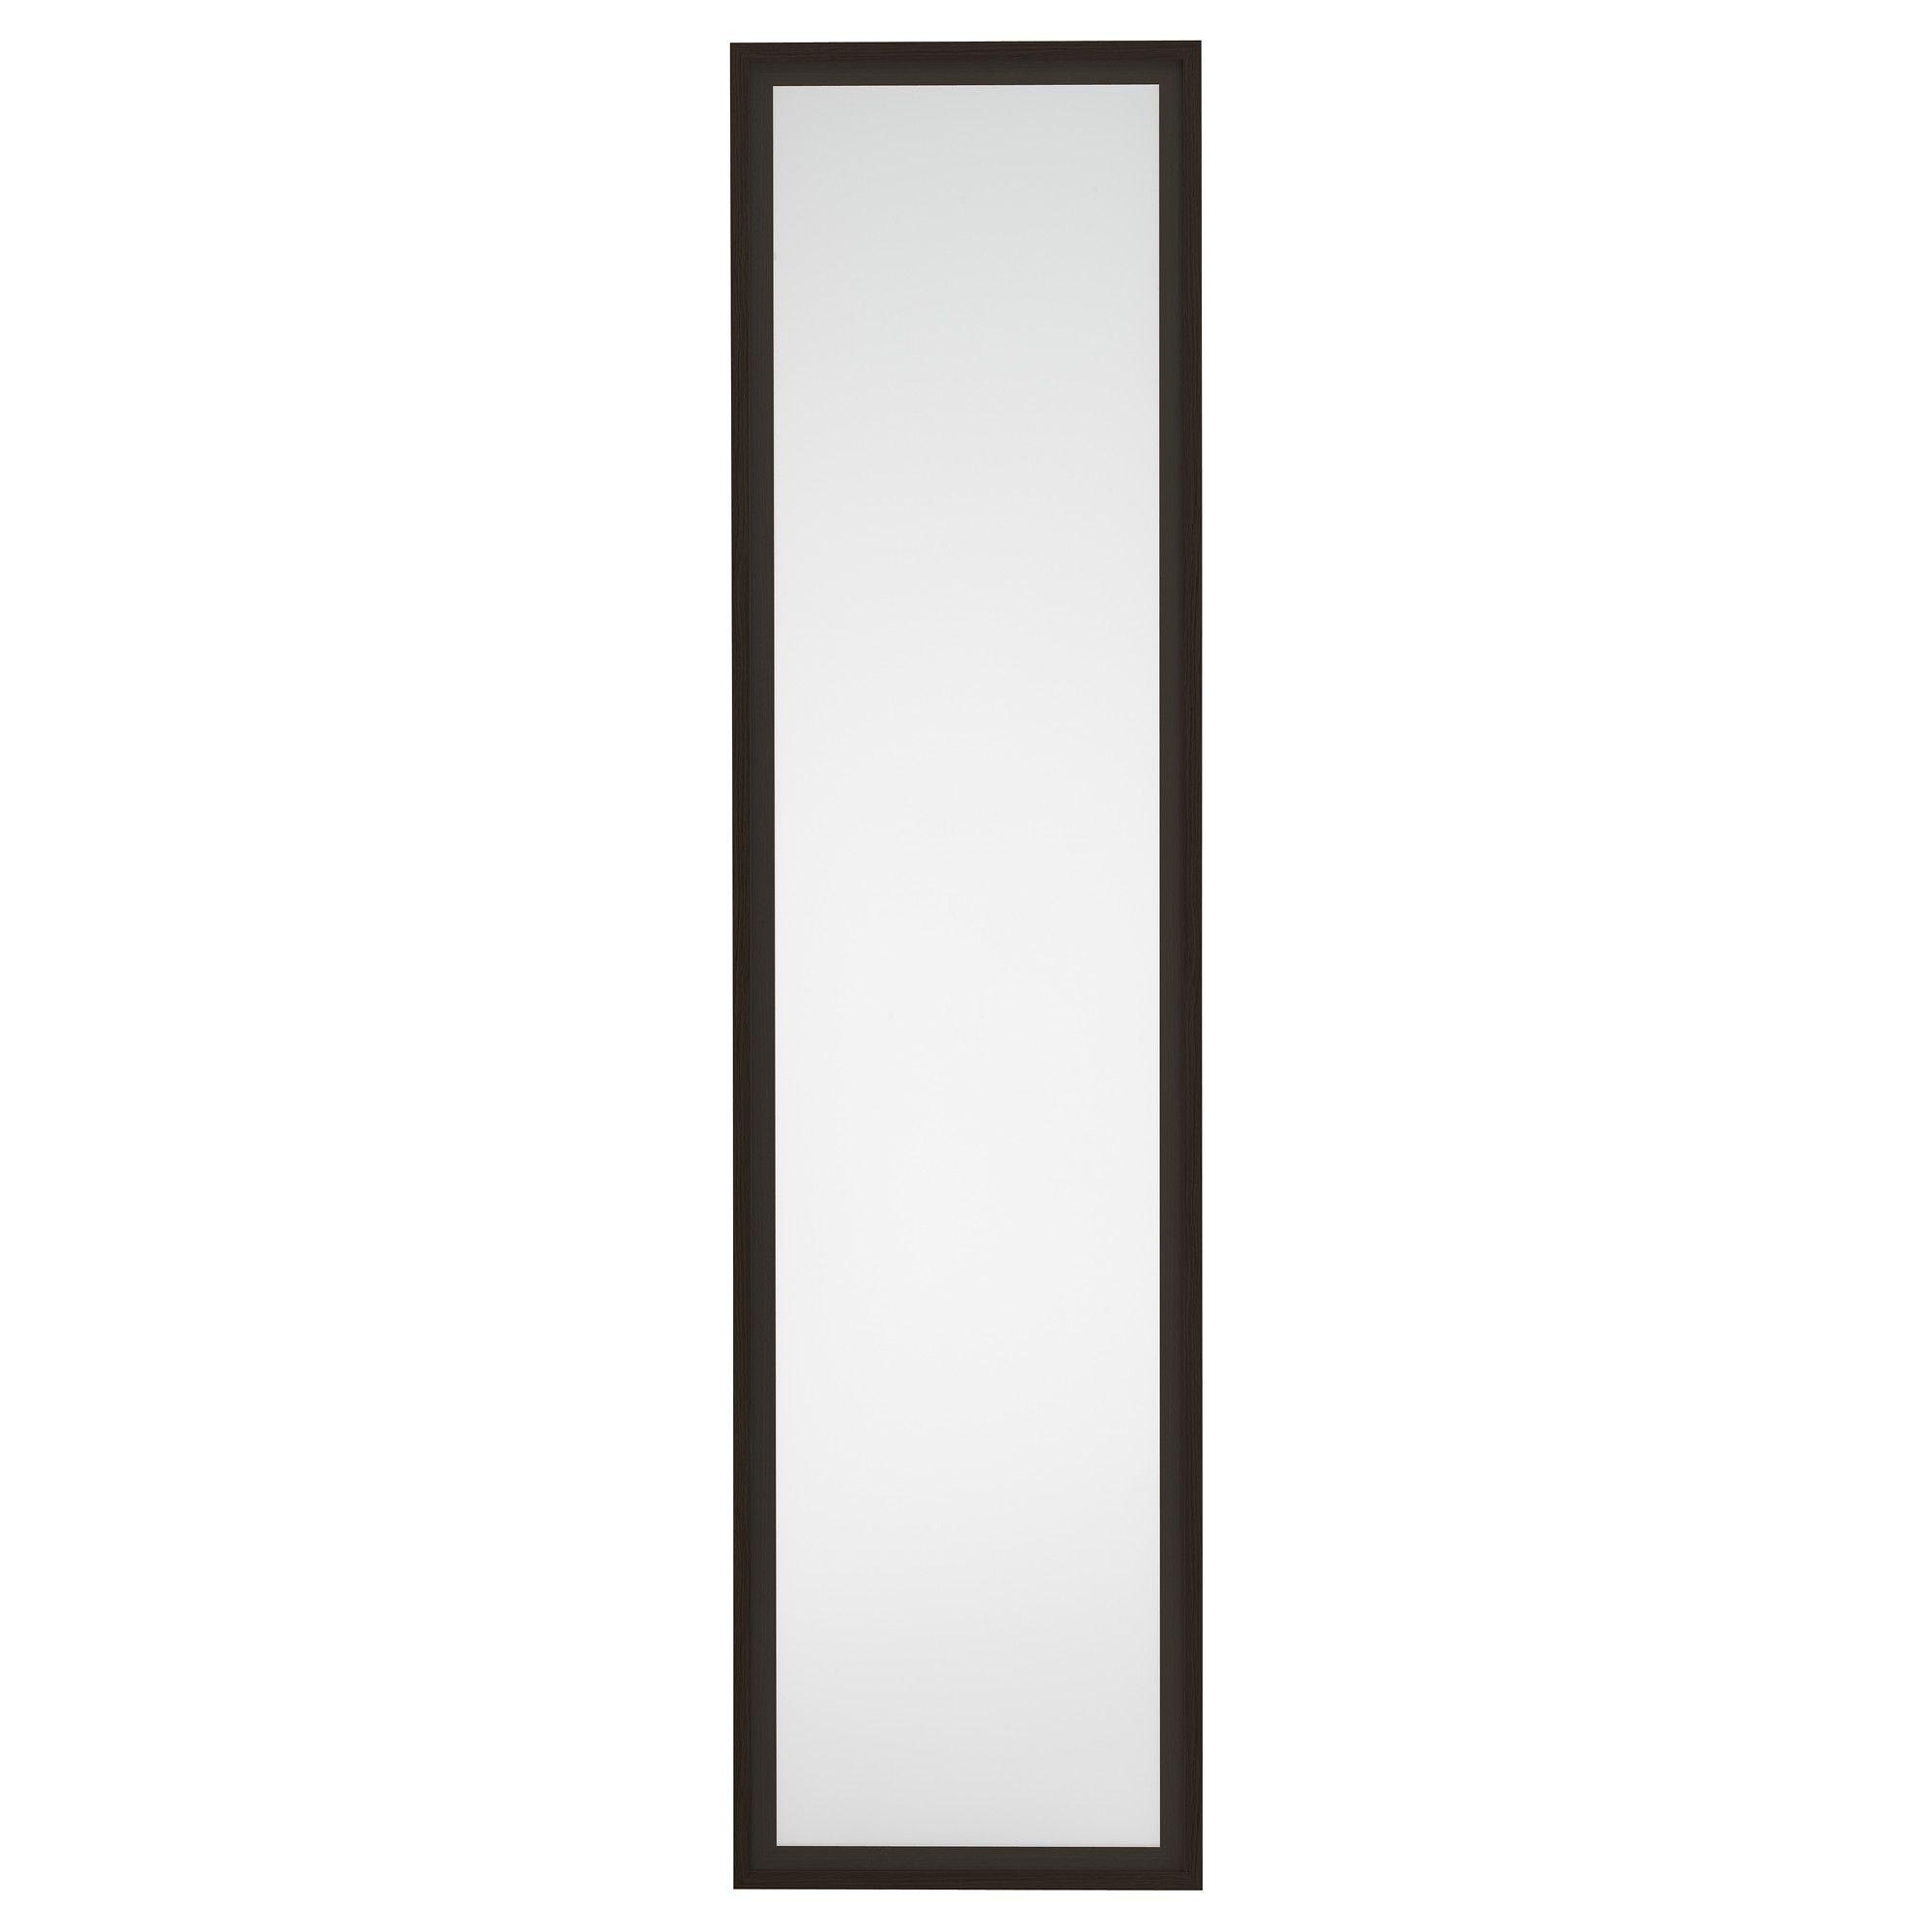 FEVIK Door - IKEA $110 | Home: Storage & Organization | Pinterest